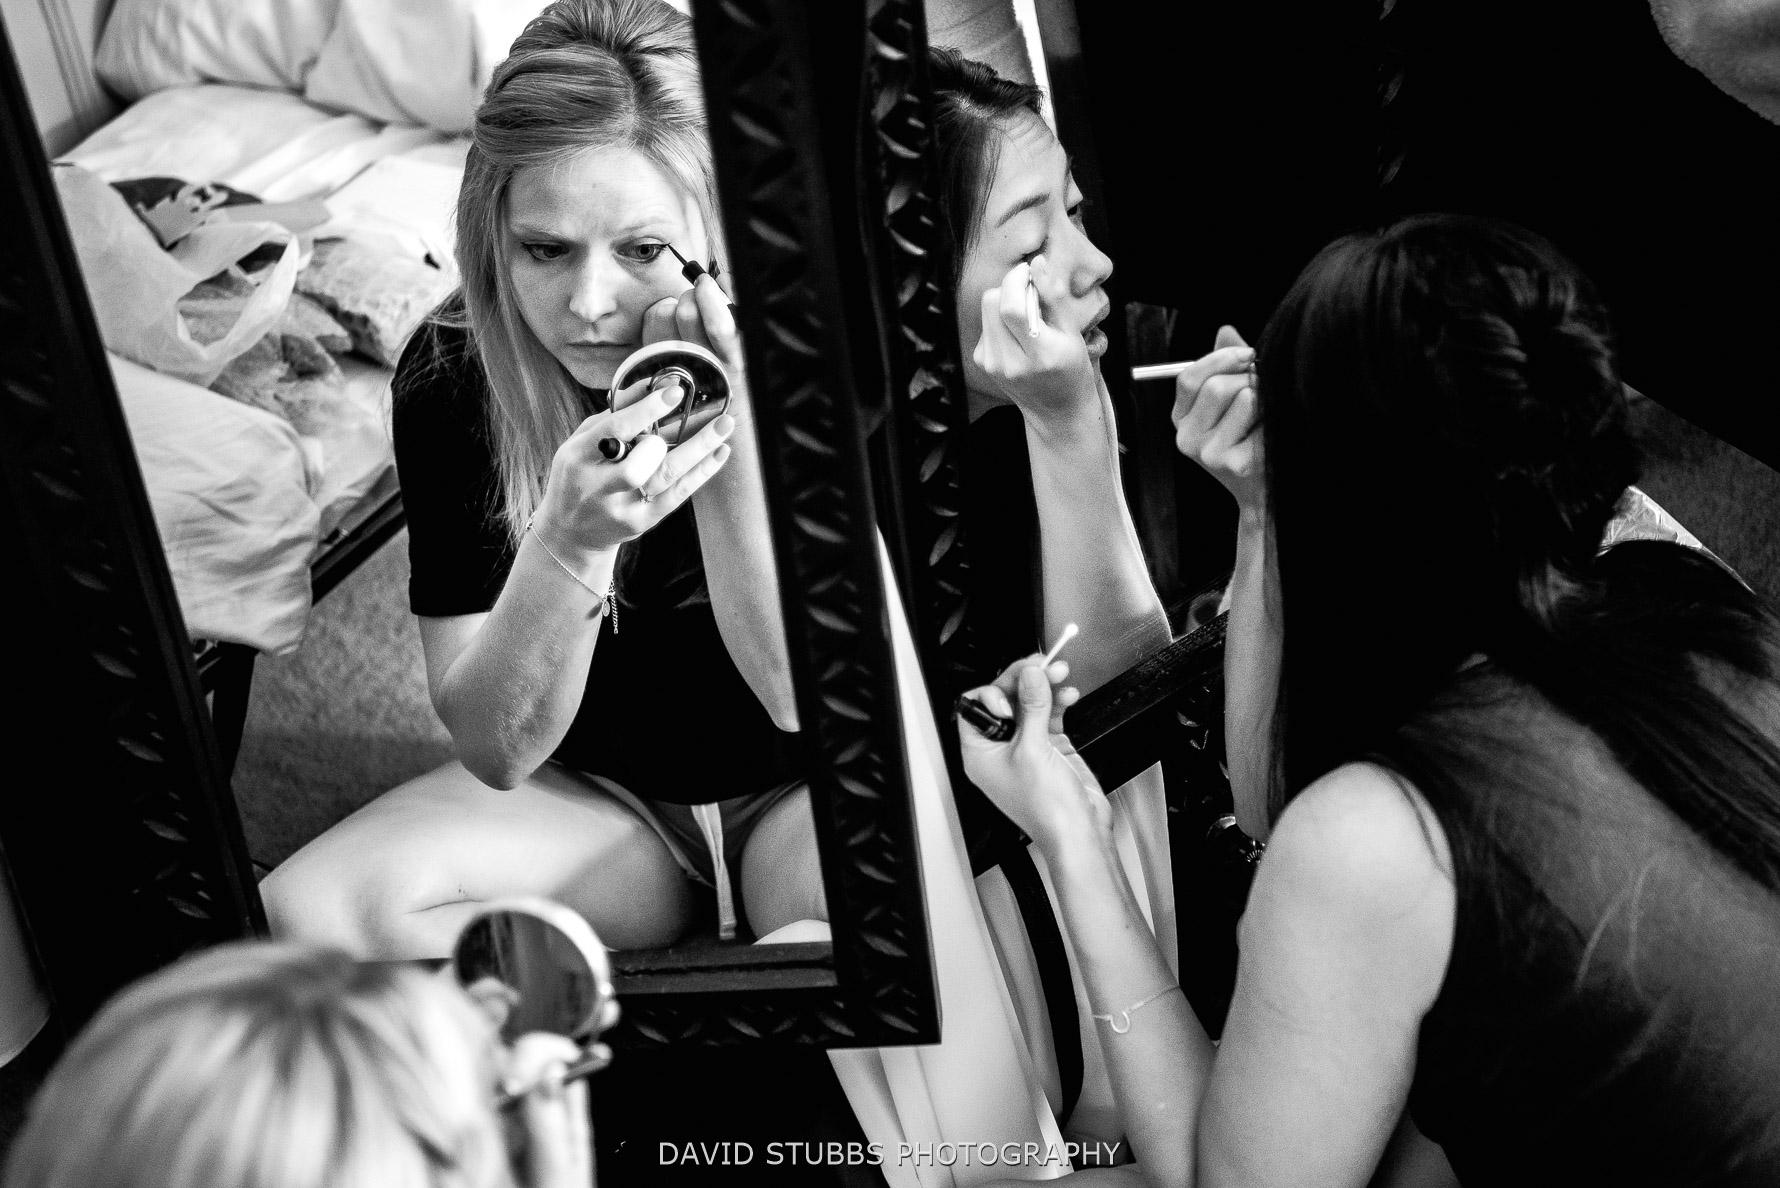 mirror reflection photo applying make-up